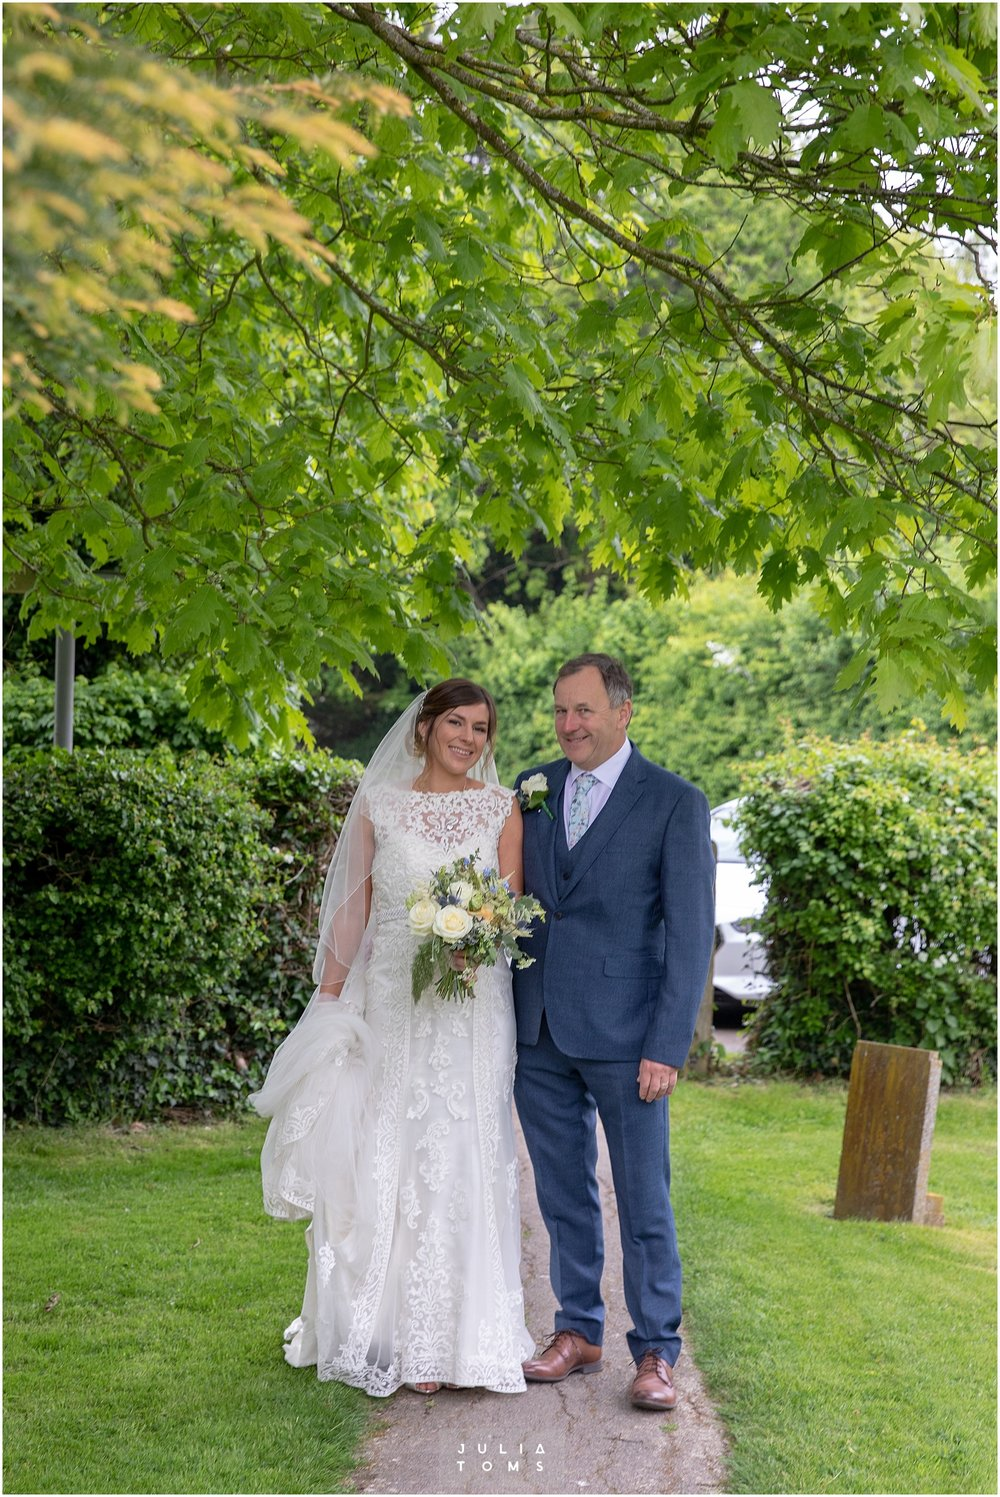 Julia_toms_chichester_wedding_photographer_008.jpg